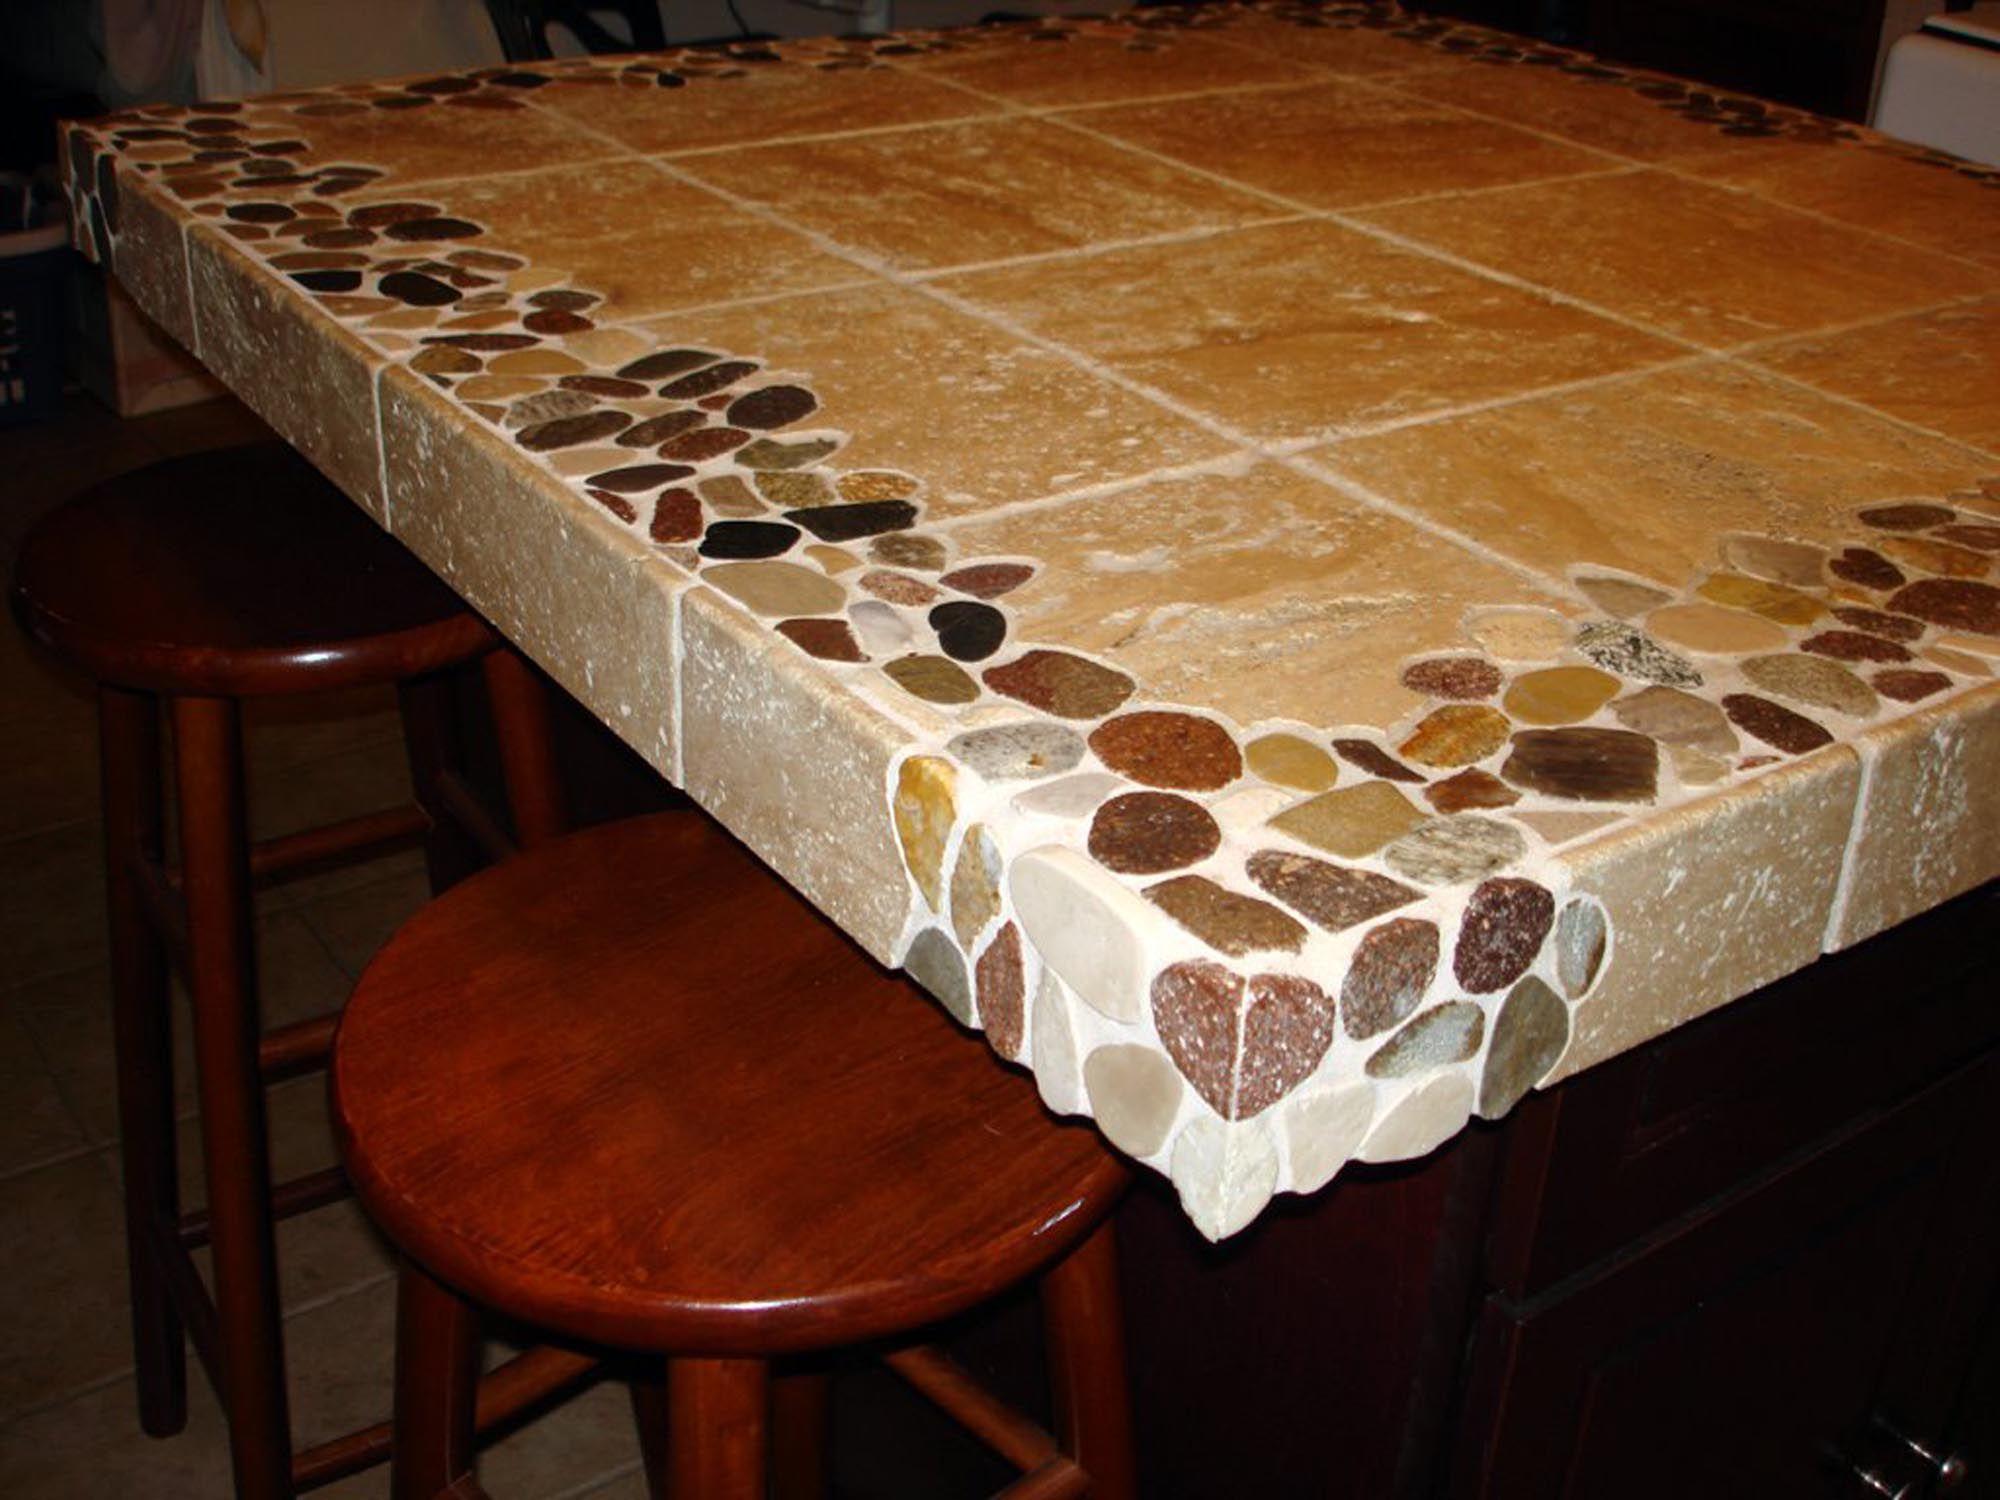 Riverstone And Travertine Custom 4 X4 Kitchen Island Countertop Tile Countertops Kitchen Tile Countertops Kitchen Island Countertop